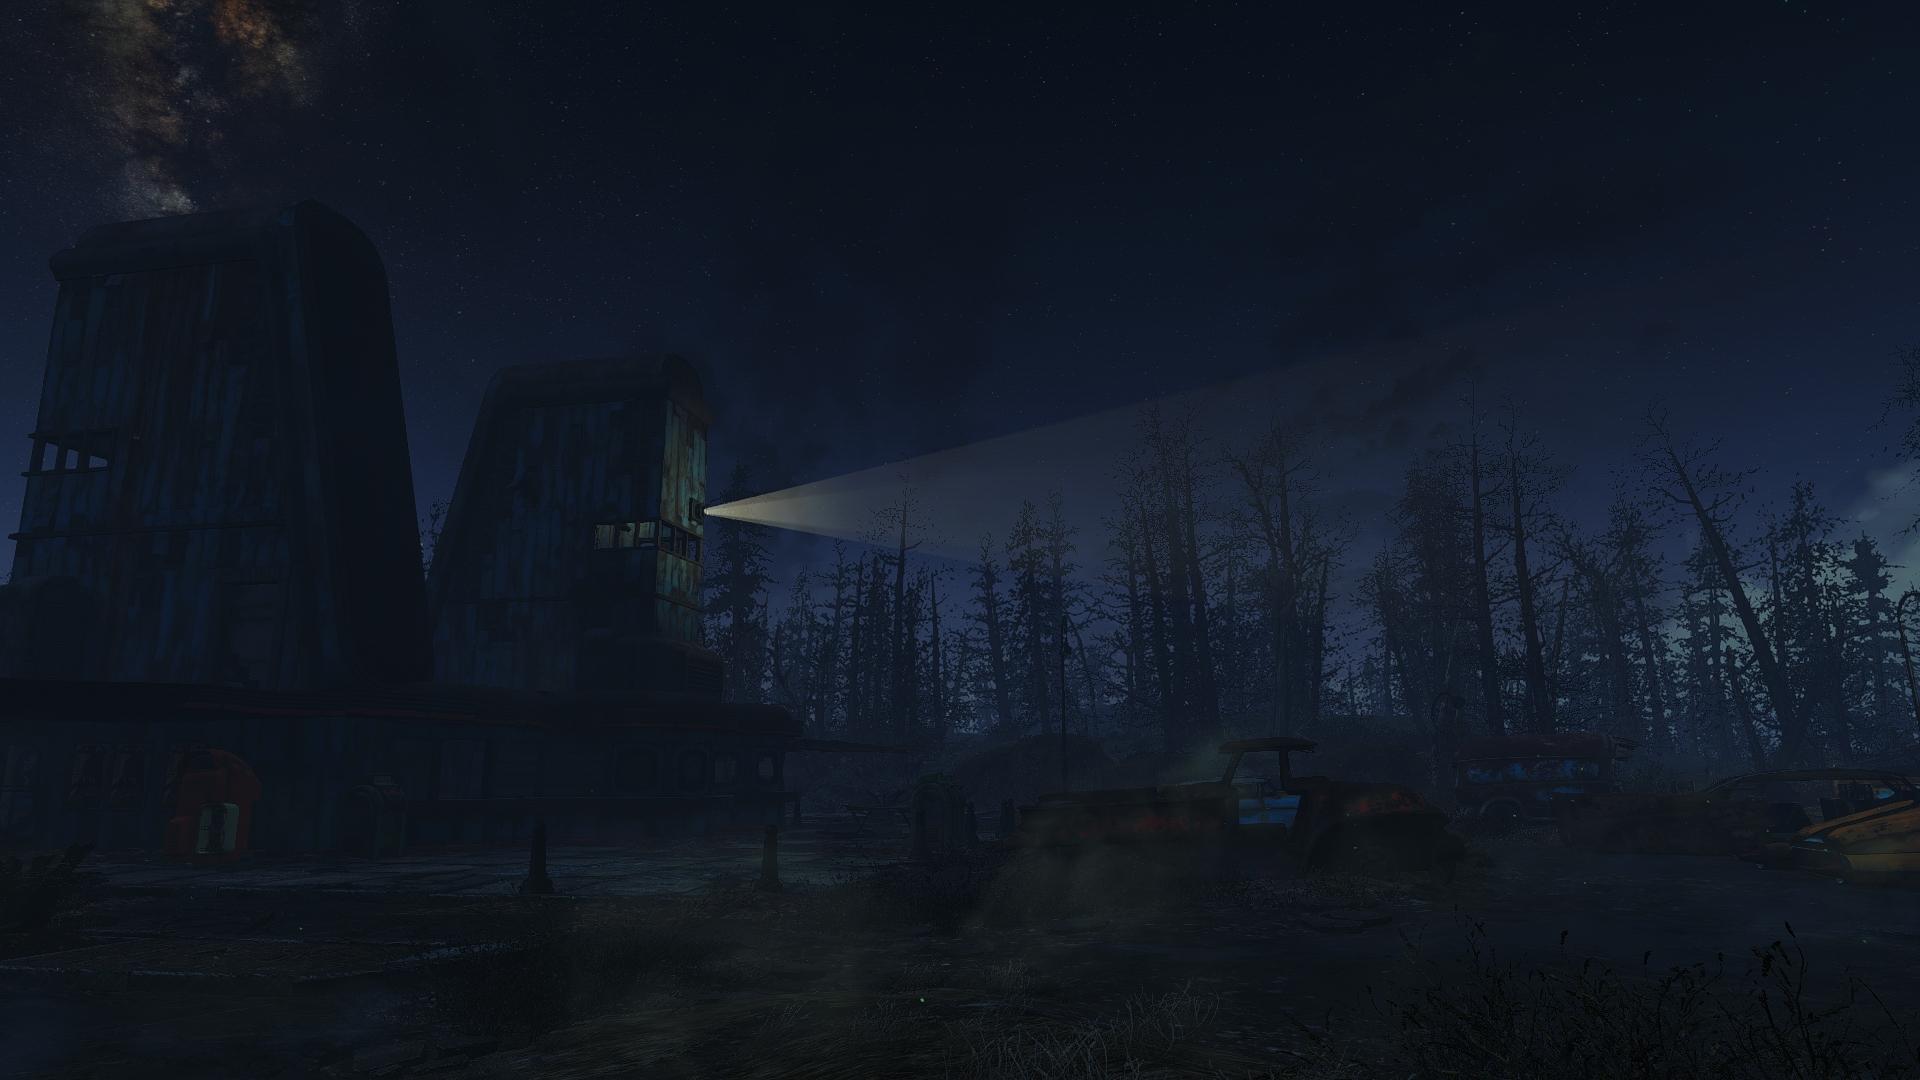 000806.Jpg - Fallout 4